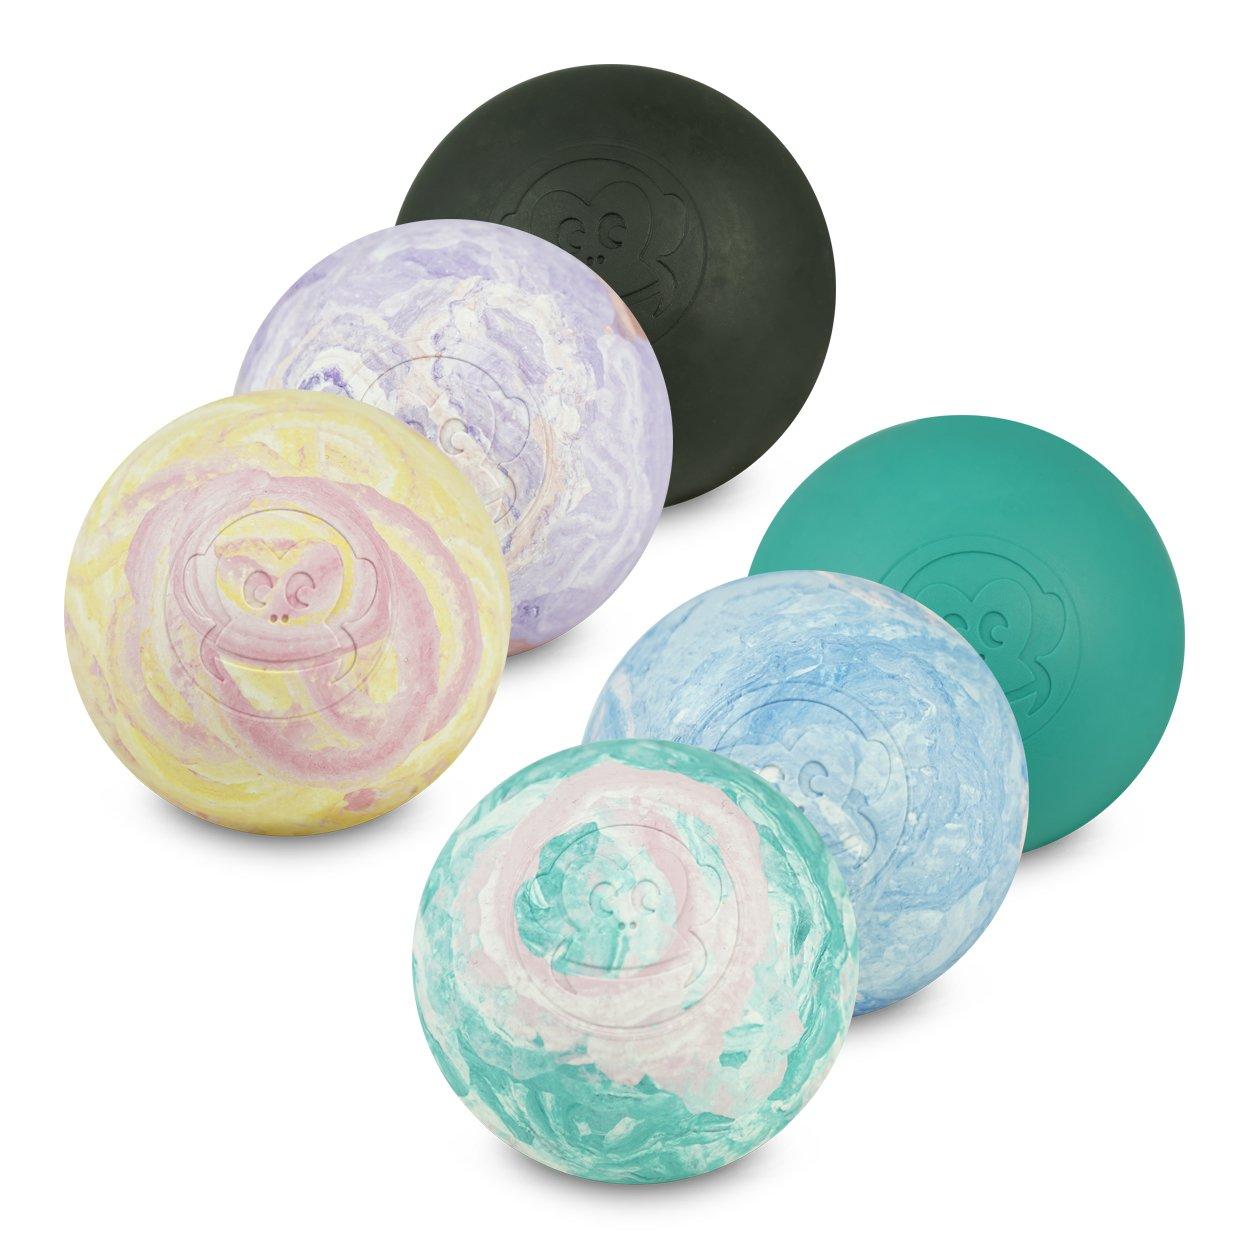 Captain LAX Massageball Original - Lacrosseball im 6er Pack in Verschiedenen Farben, aus Hartgummi, Grö ß e einzeln 6 x 6 cm geeignet fü r Triggerpunkt- & Faszienmassage/Crossfit